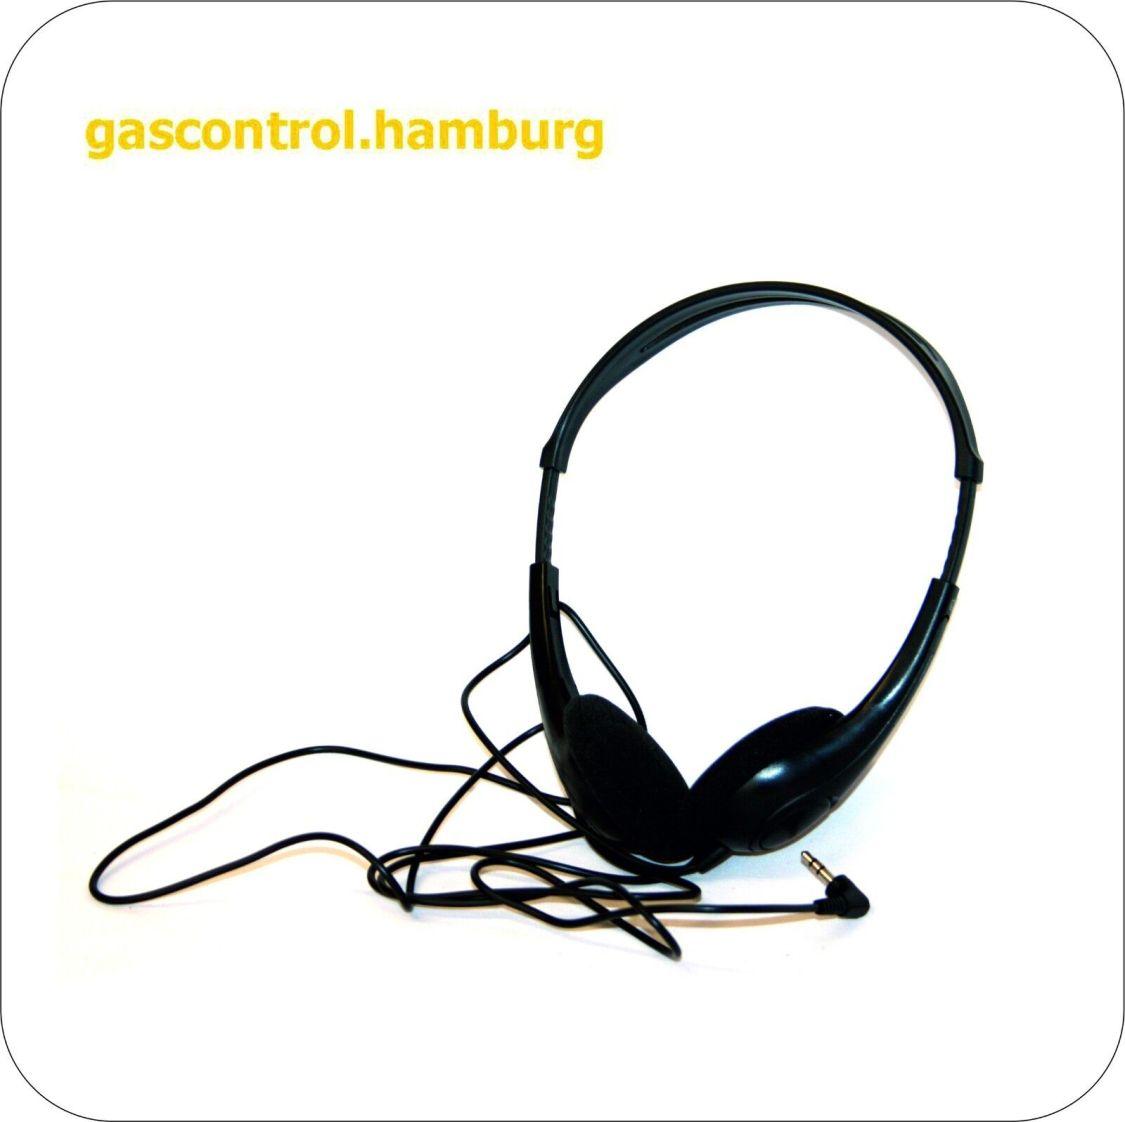 Kopfhörer Ultraleicht 3,5mm Klinkestecker schwarz komfortabel guter Klang